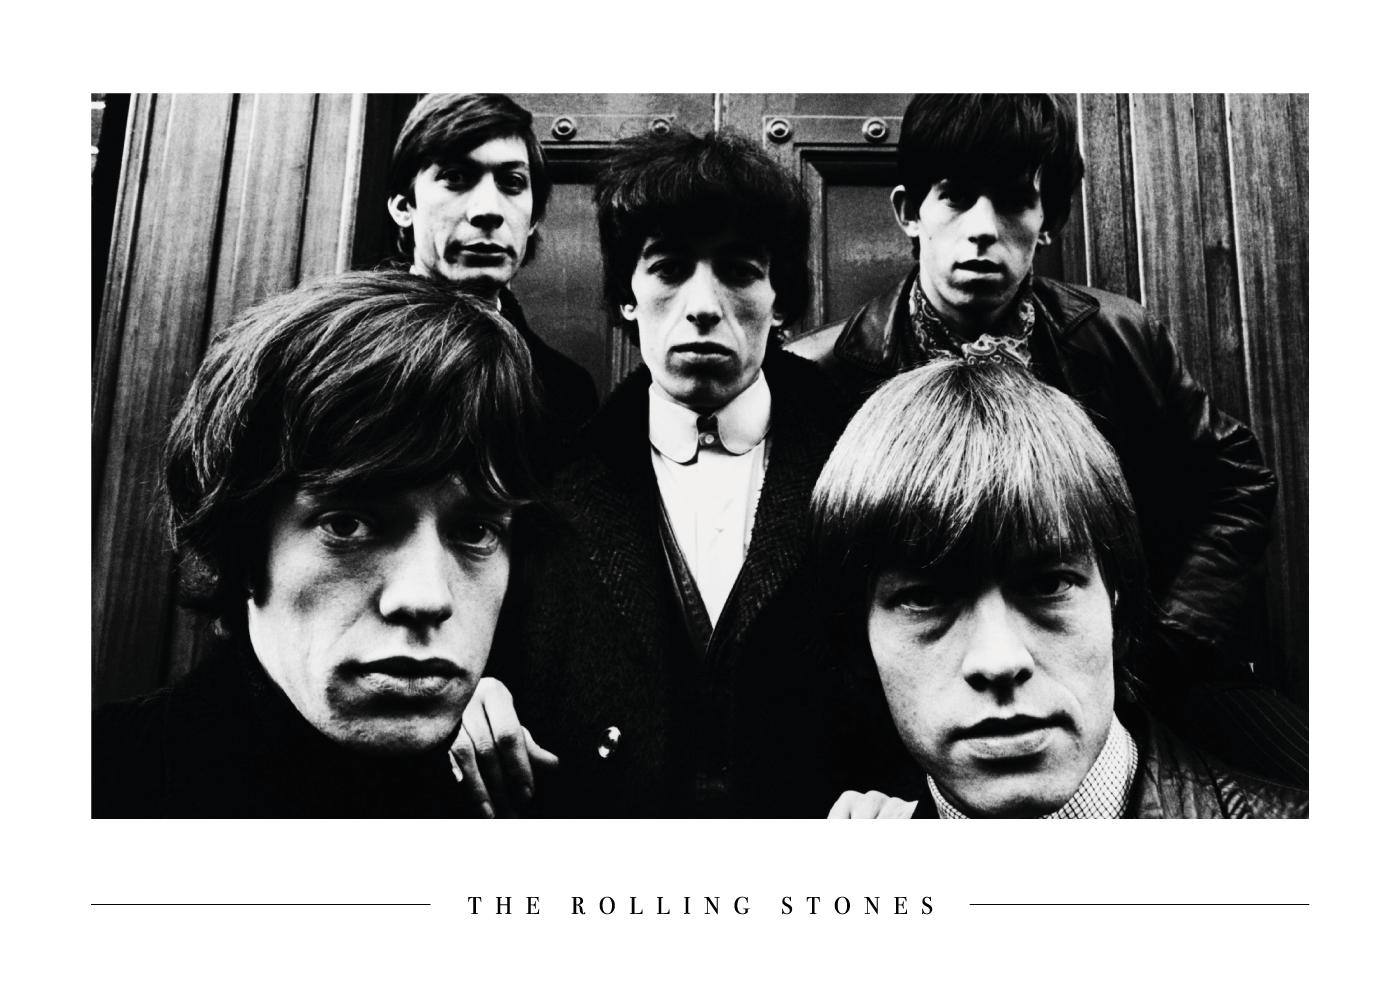 The Rolling Stones - Plakat